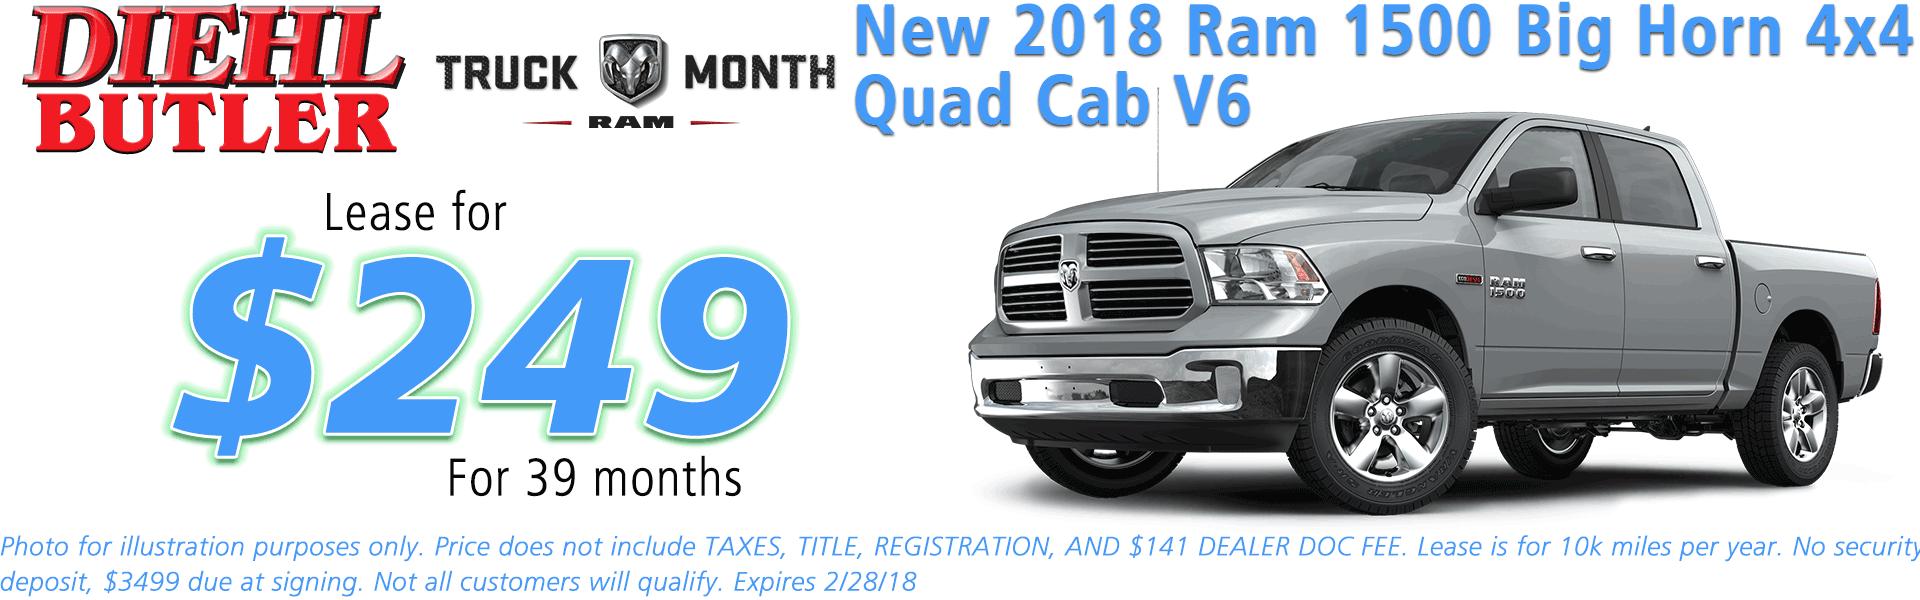 NEW 2018 RAM 1500 BIG HORN QUAD CAB® 4X4 6'4 BOX diehl automotive butler pa 16002 chrysler jeep dodge ram